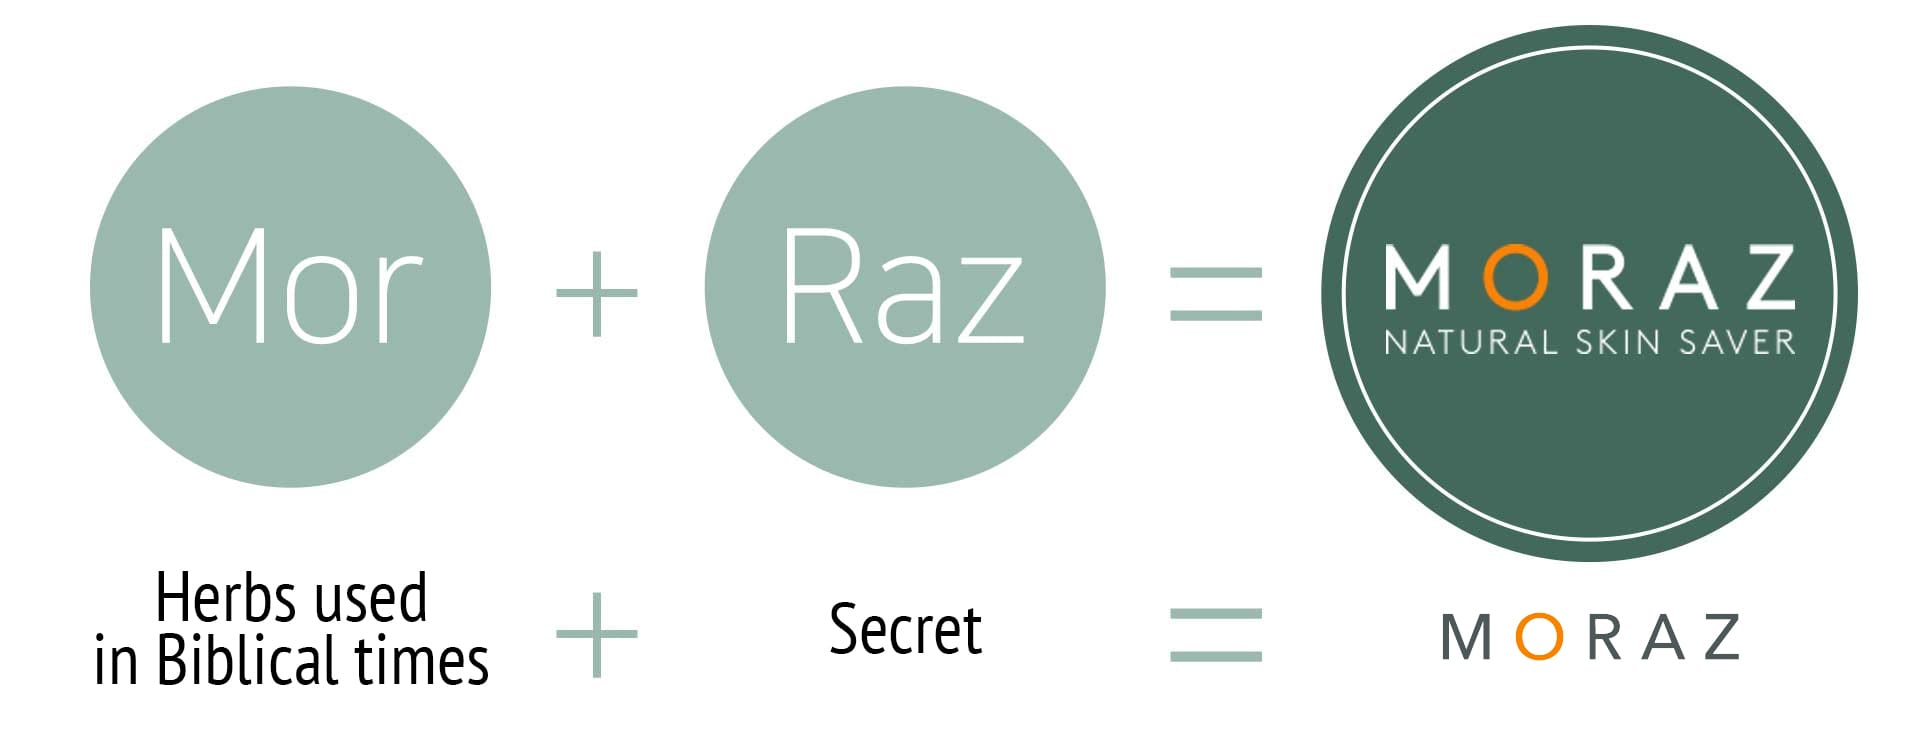 Moraz-Brand-Image